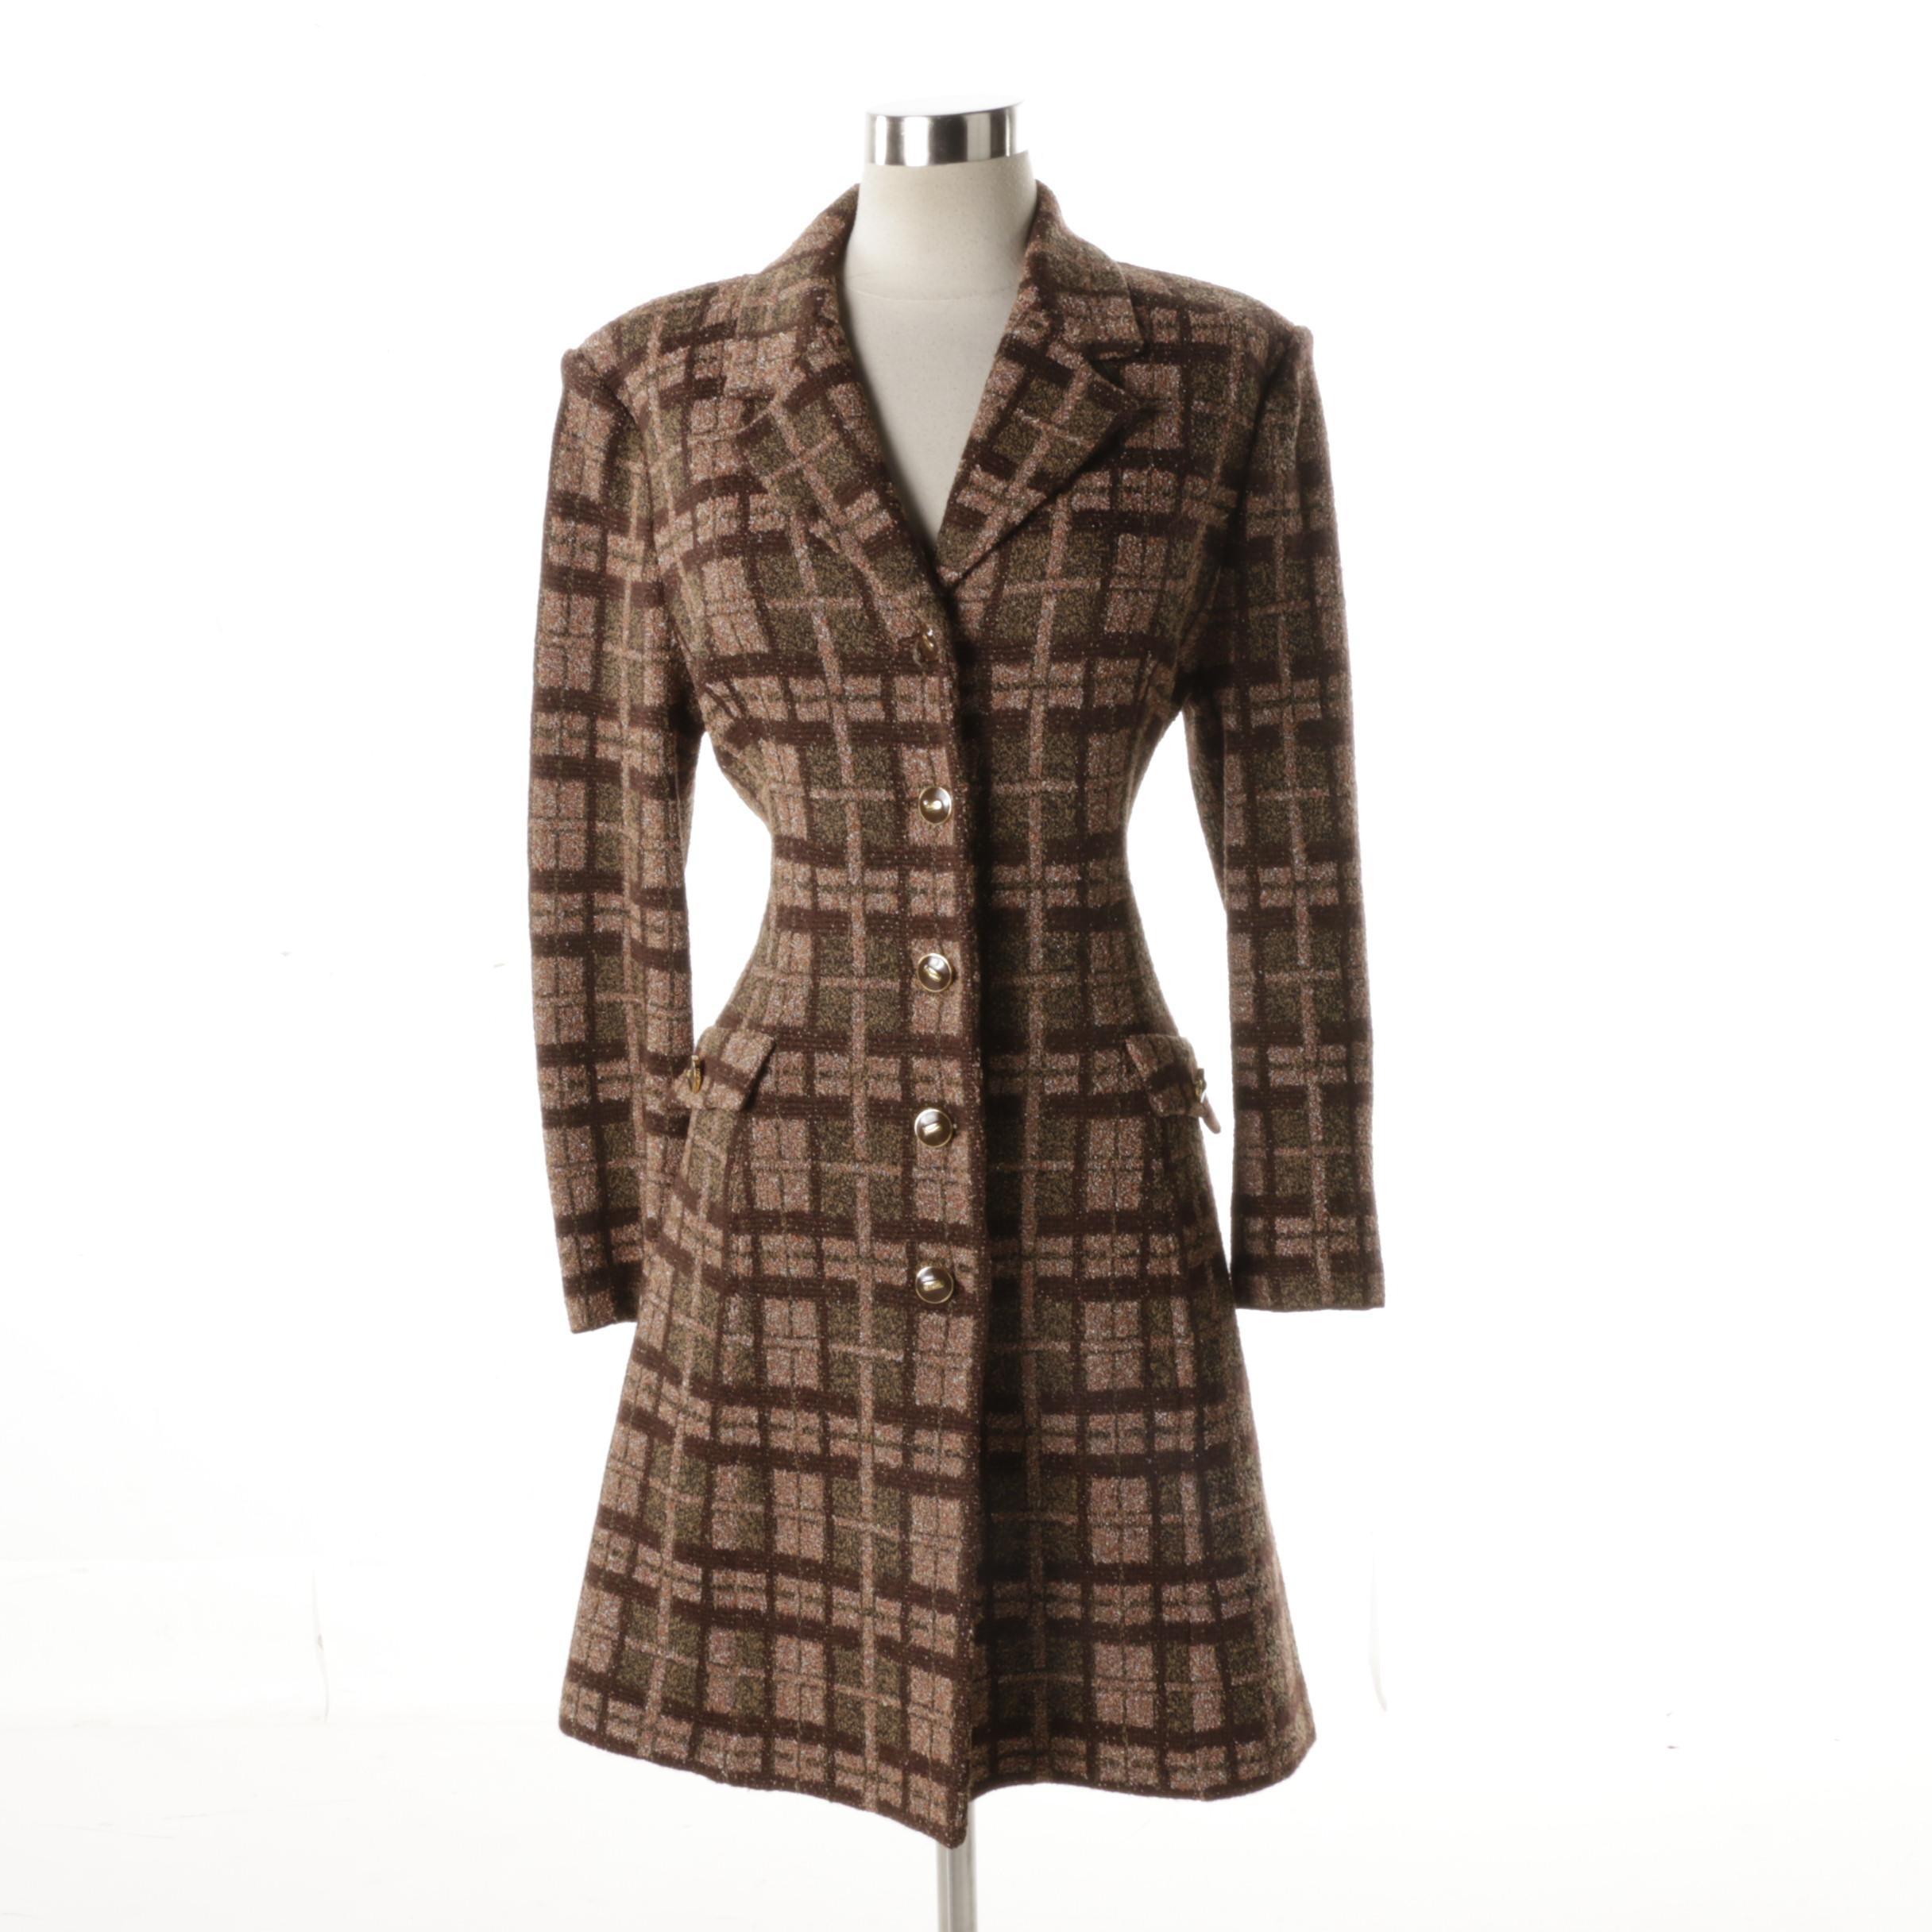 Women's Vintage Marie Gray Plaid Coat with Brown Belt